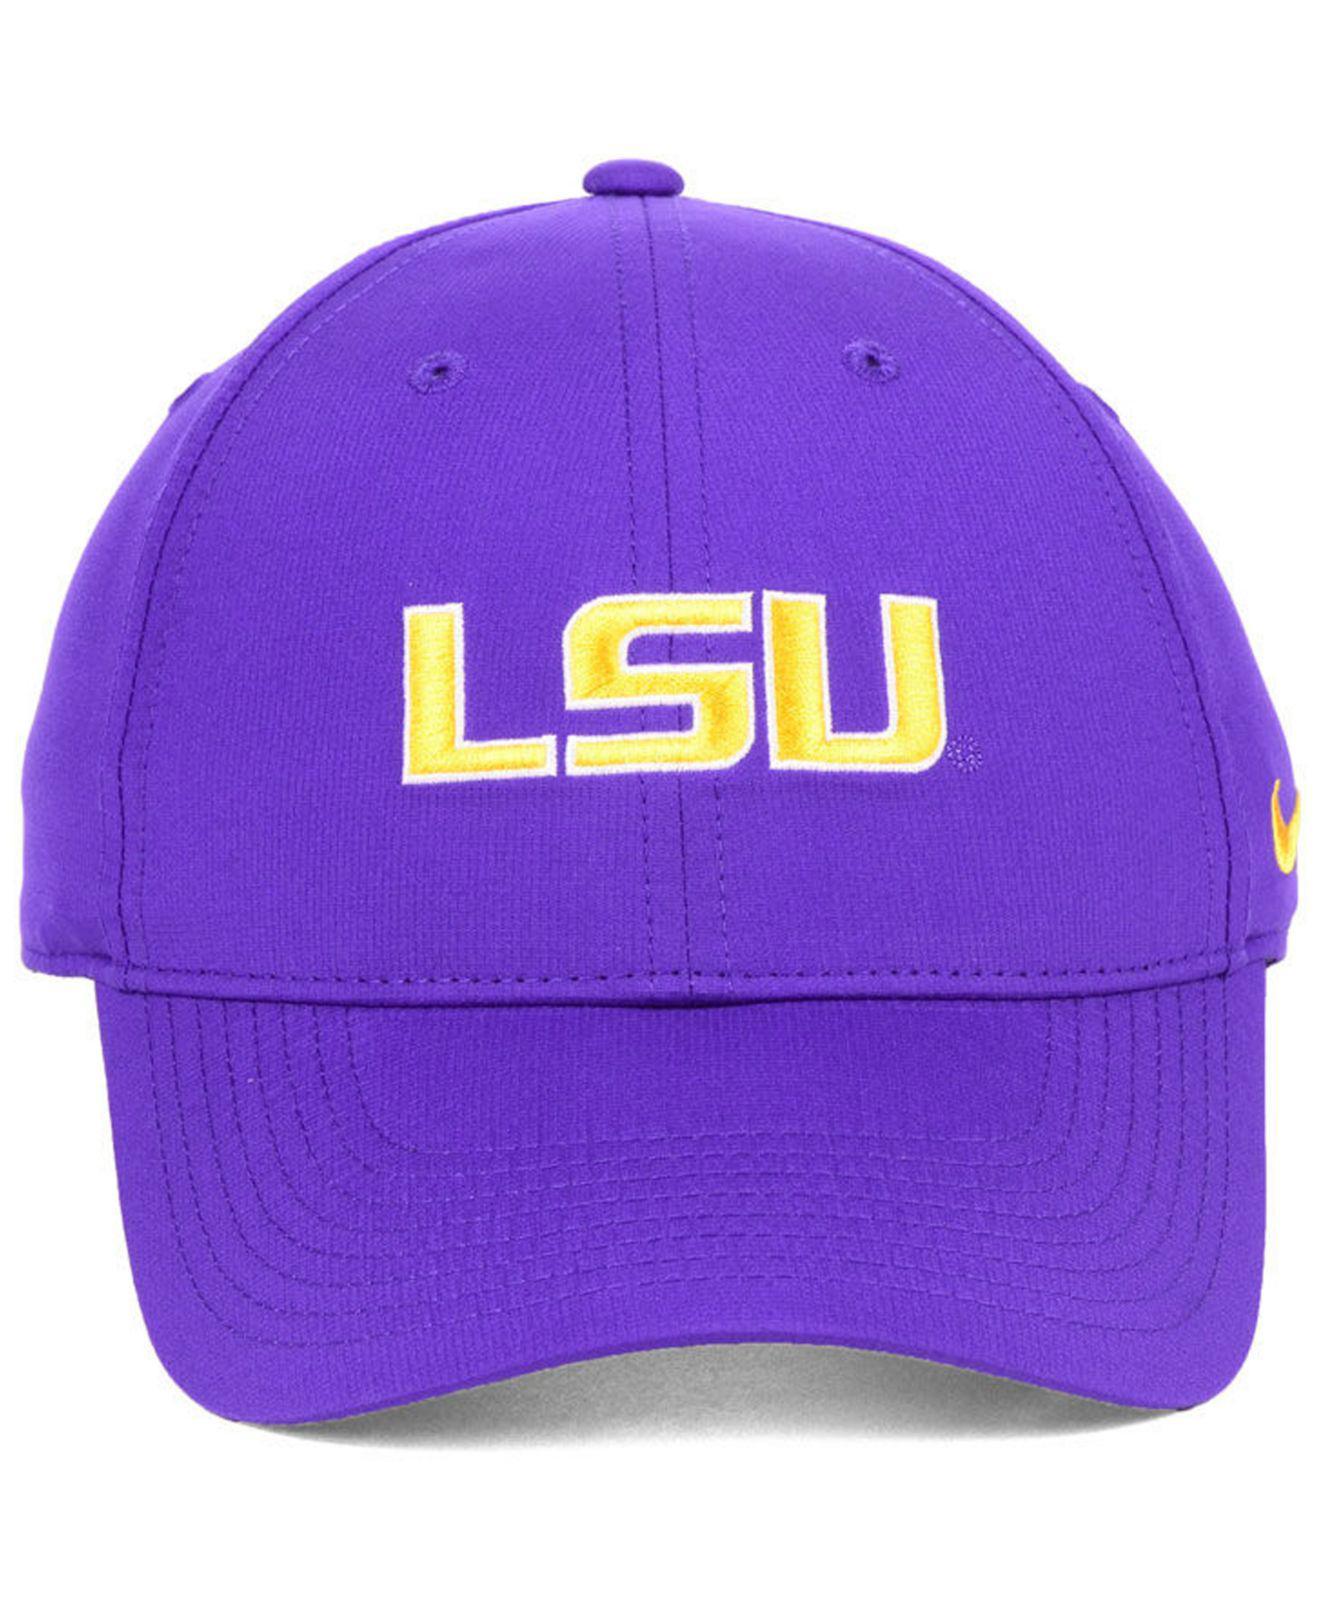 hot sale online 8c048 03885 Lyst - Nike Lsu Tigers Dri-fit Adjustable Cap in Purple for Men